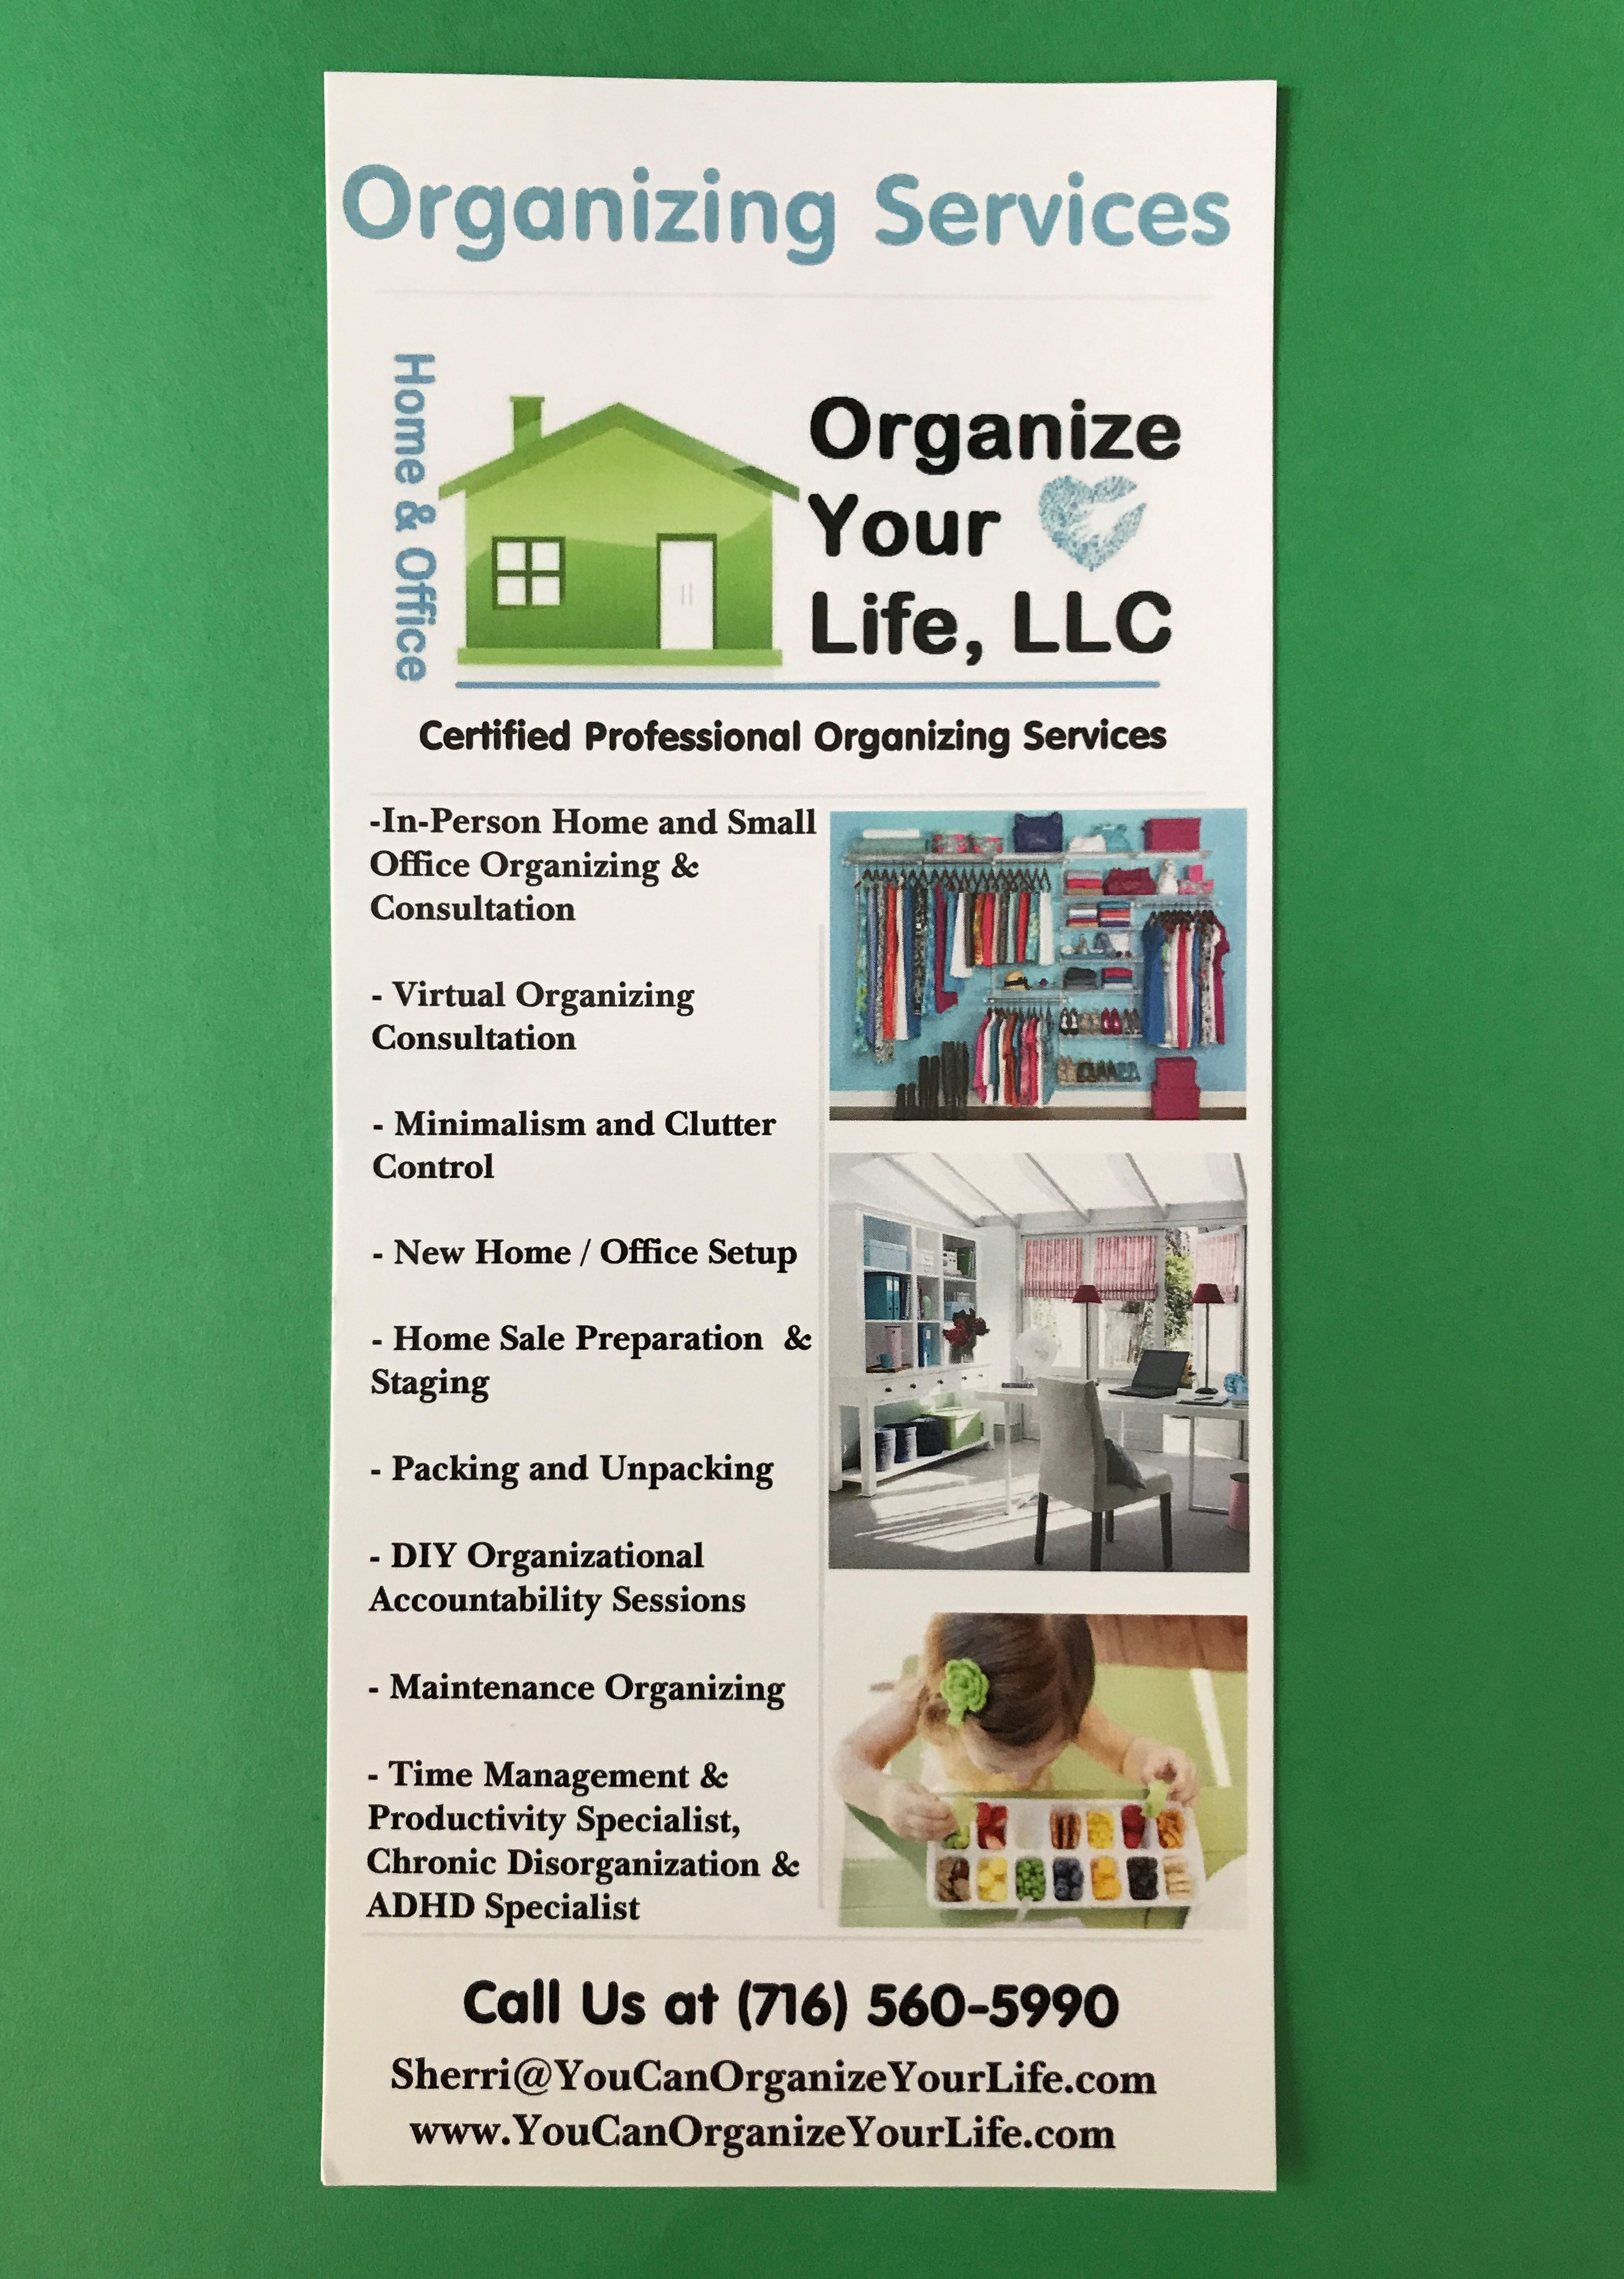 Organize Your Life LLC image 6